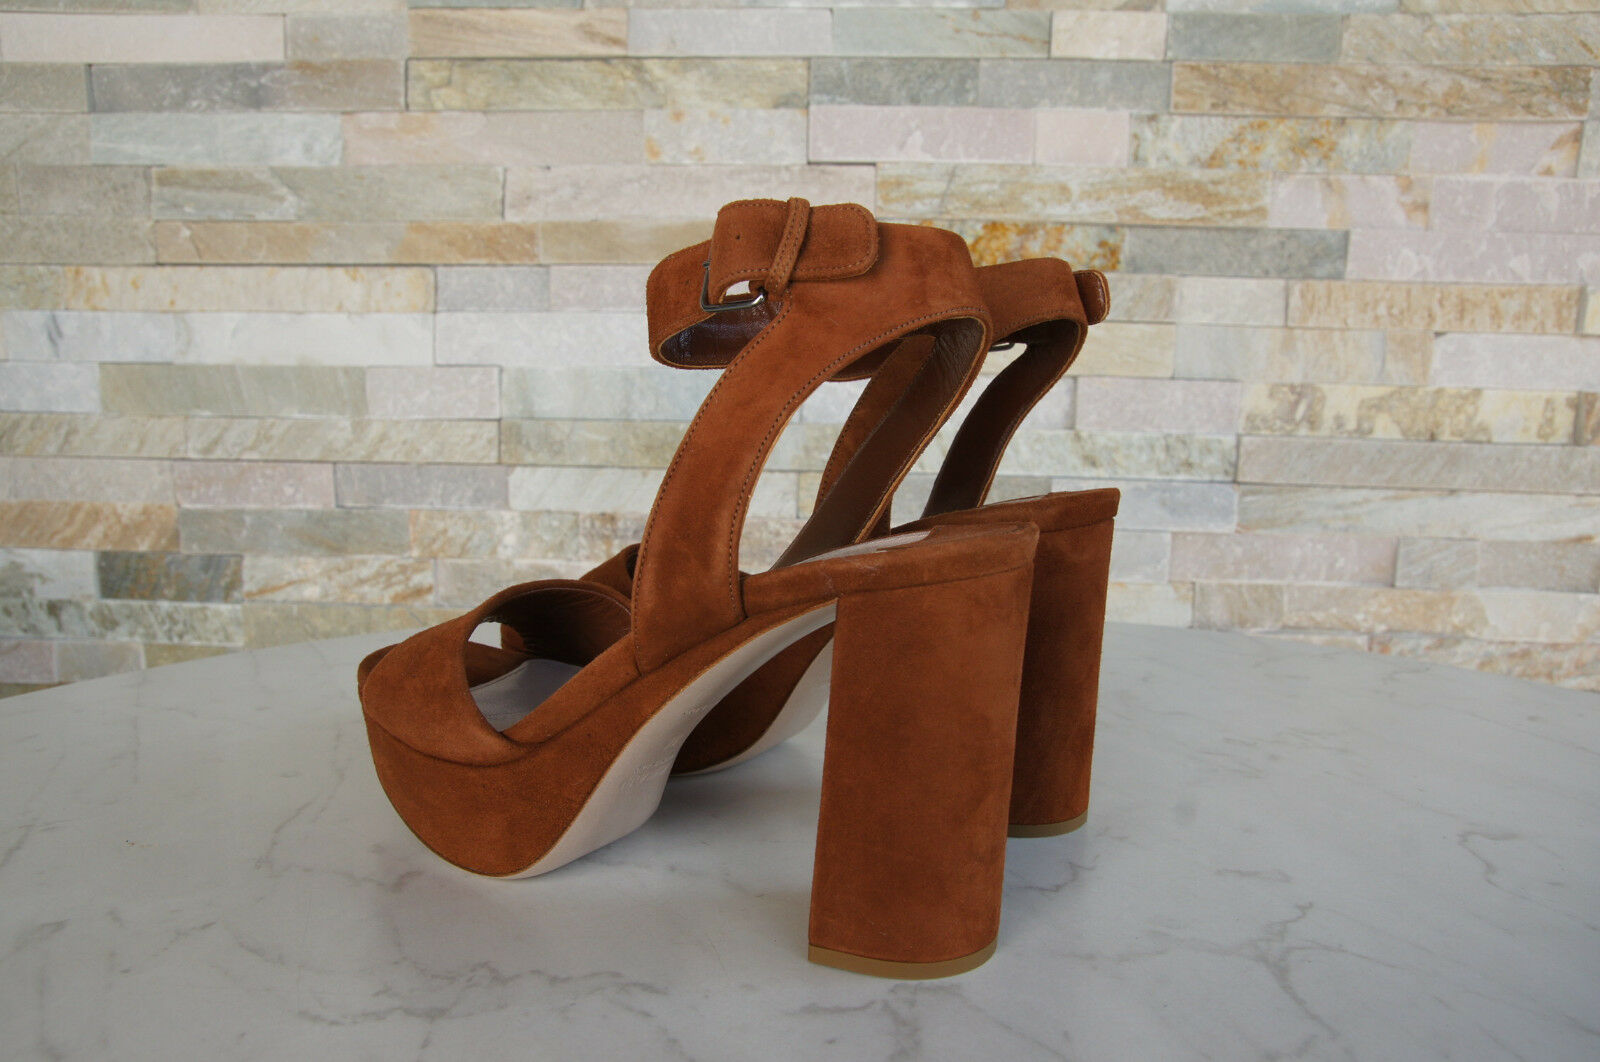 MIU Sandaletten MIU Gr 40 Plateau Sandaletten MIU Sandales Schuhe braun palisander NEU 72f6ab